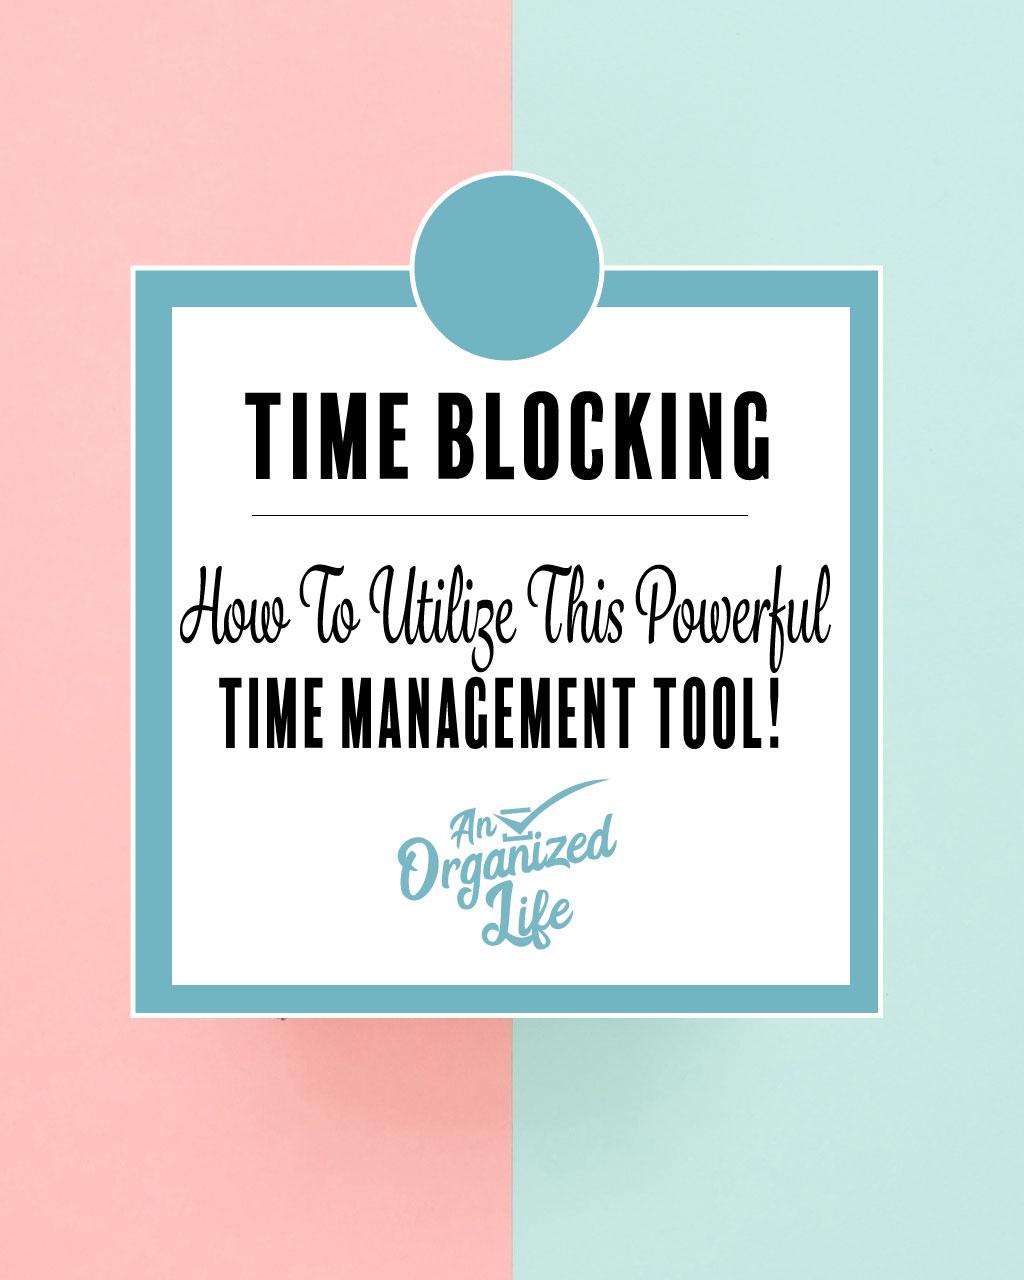 Time blocking: An Organized Life